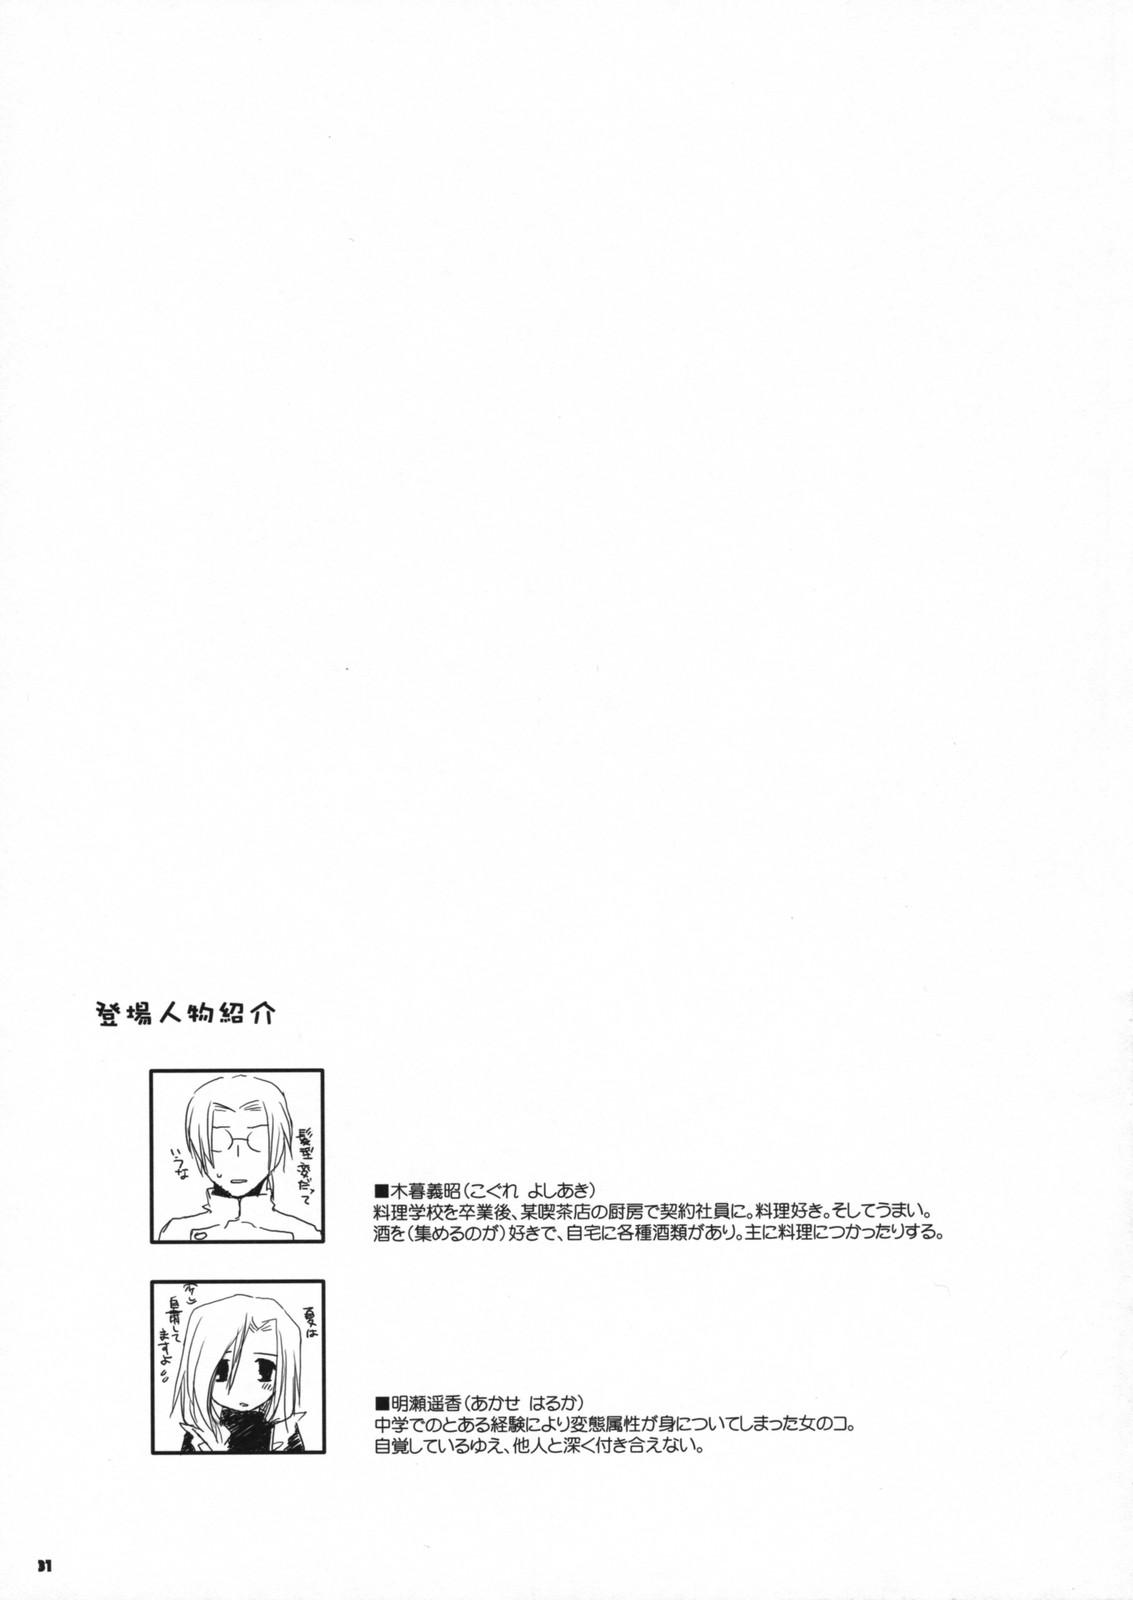 Seifuku Rakuen 21 - Costume Paradise 21 29